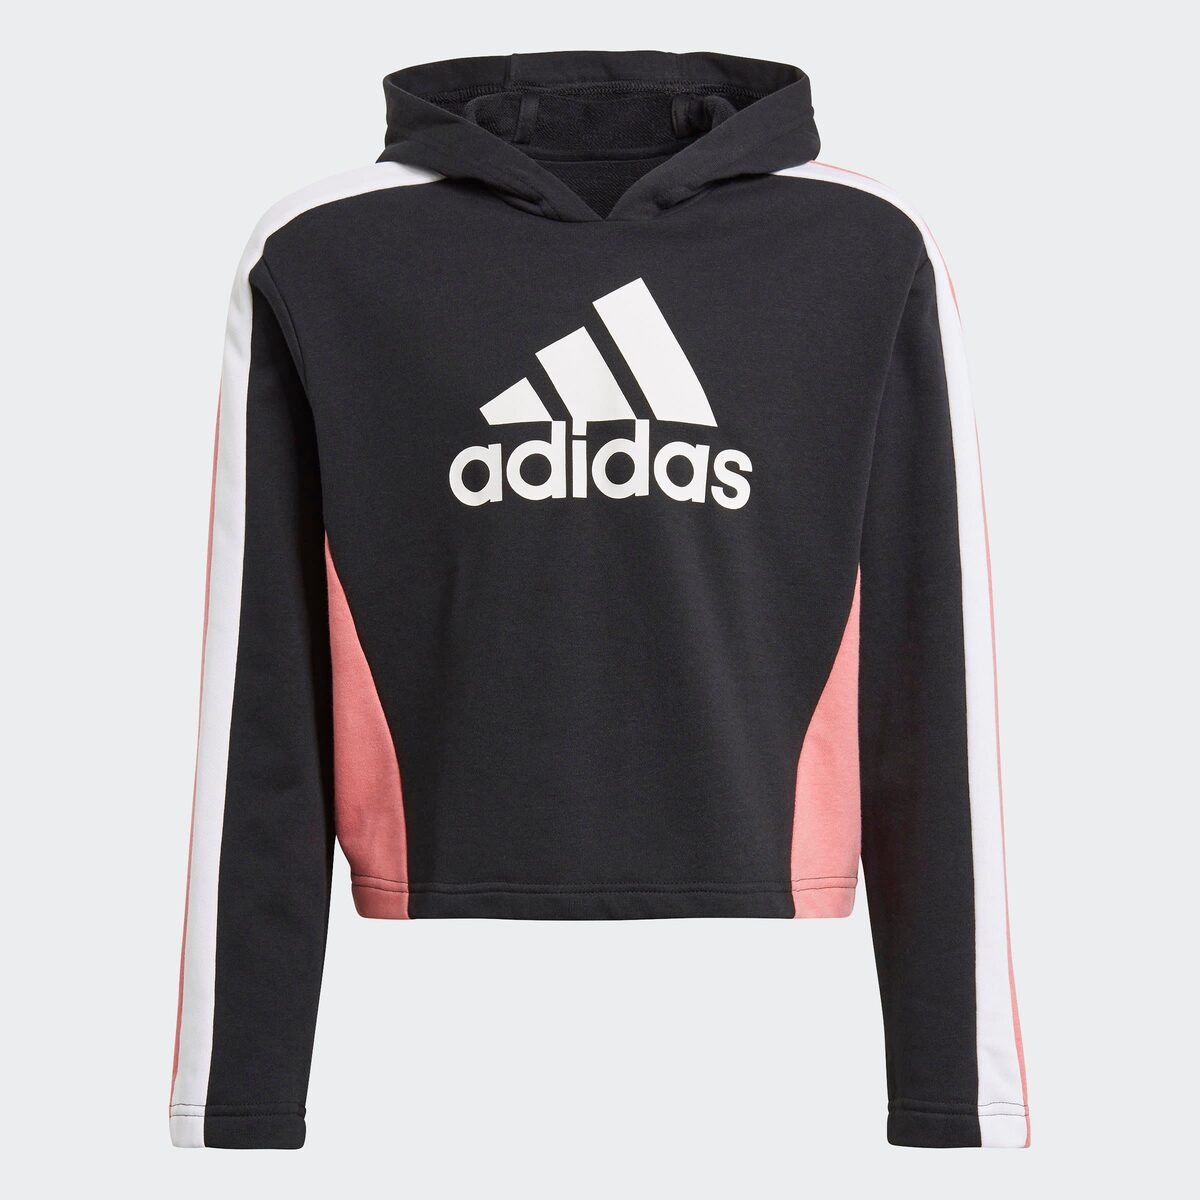 Bild 1 von adidas Performance Trainingsanzug »COLORBLOCK CROP TOP«